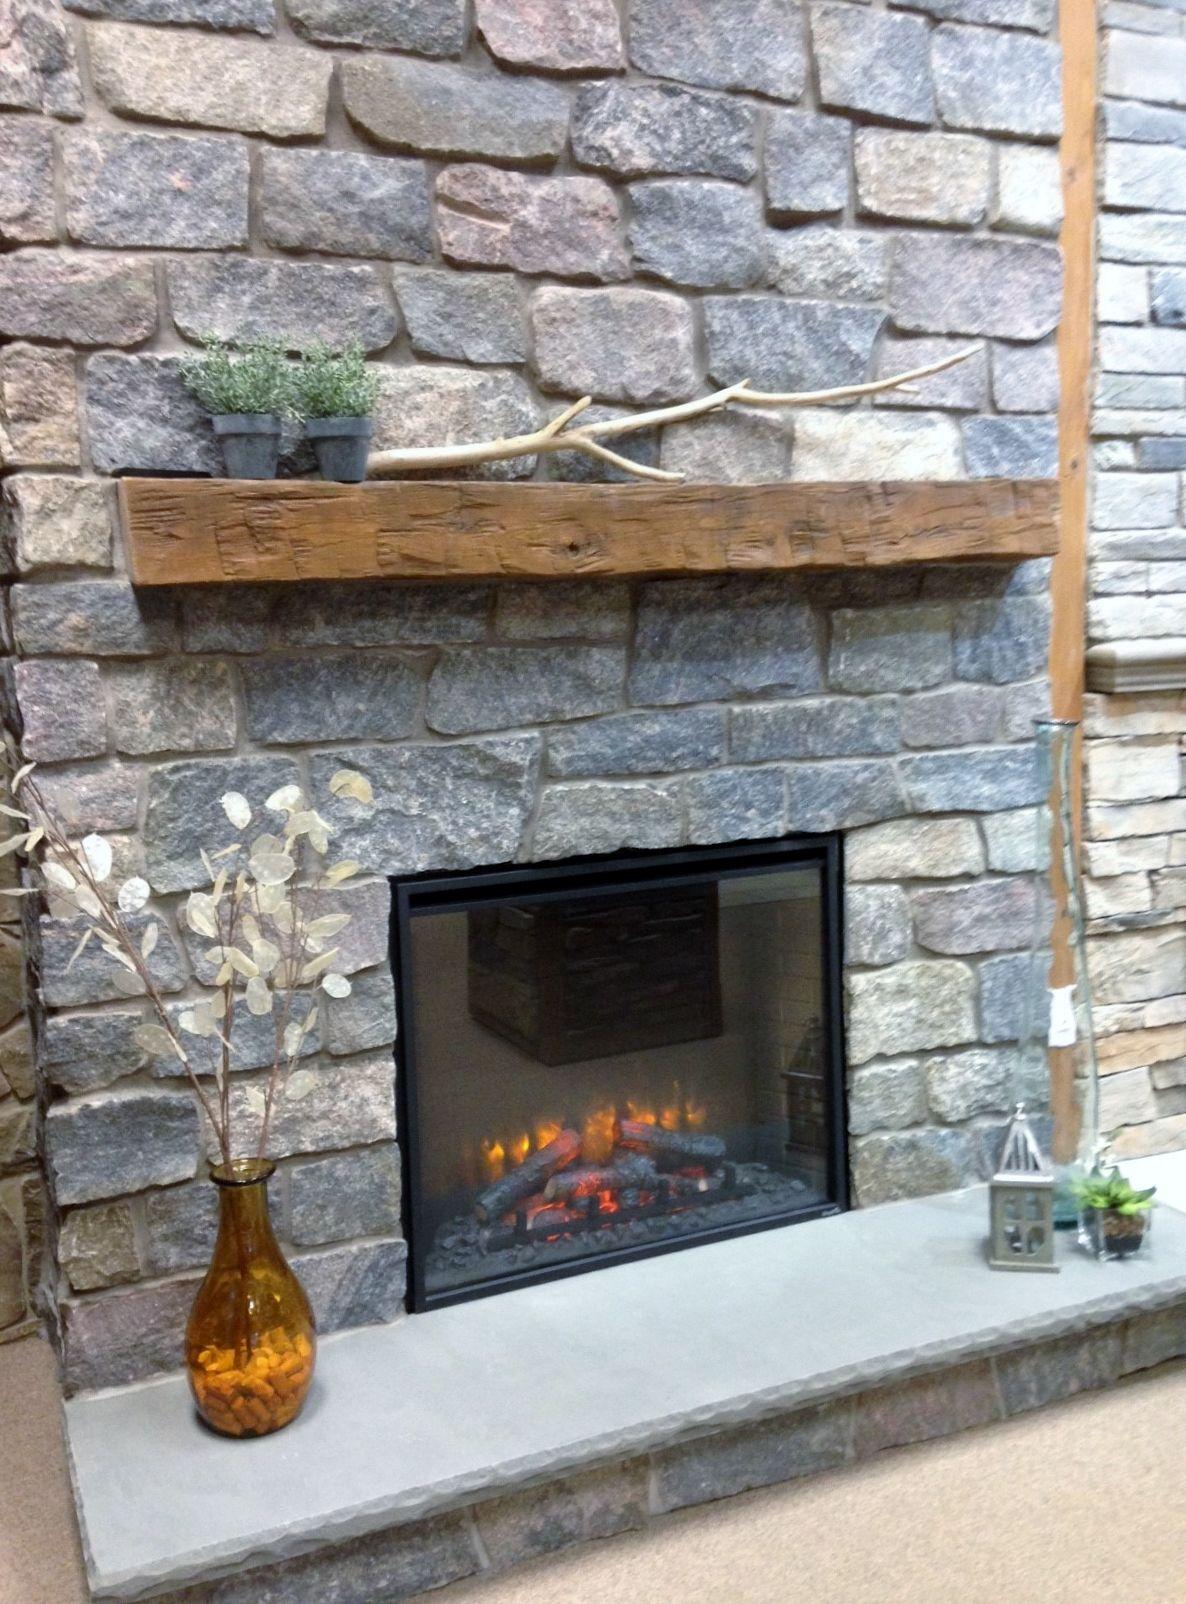 Quarry Cut Natural Stone Fireplace Surround Barn Beam